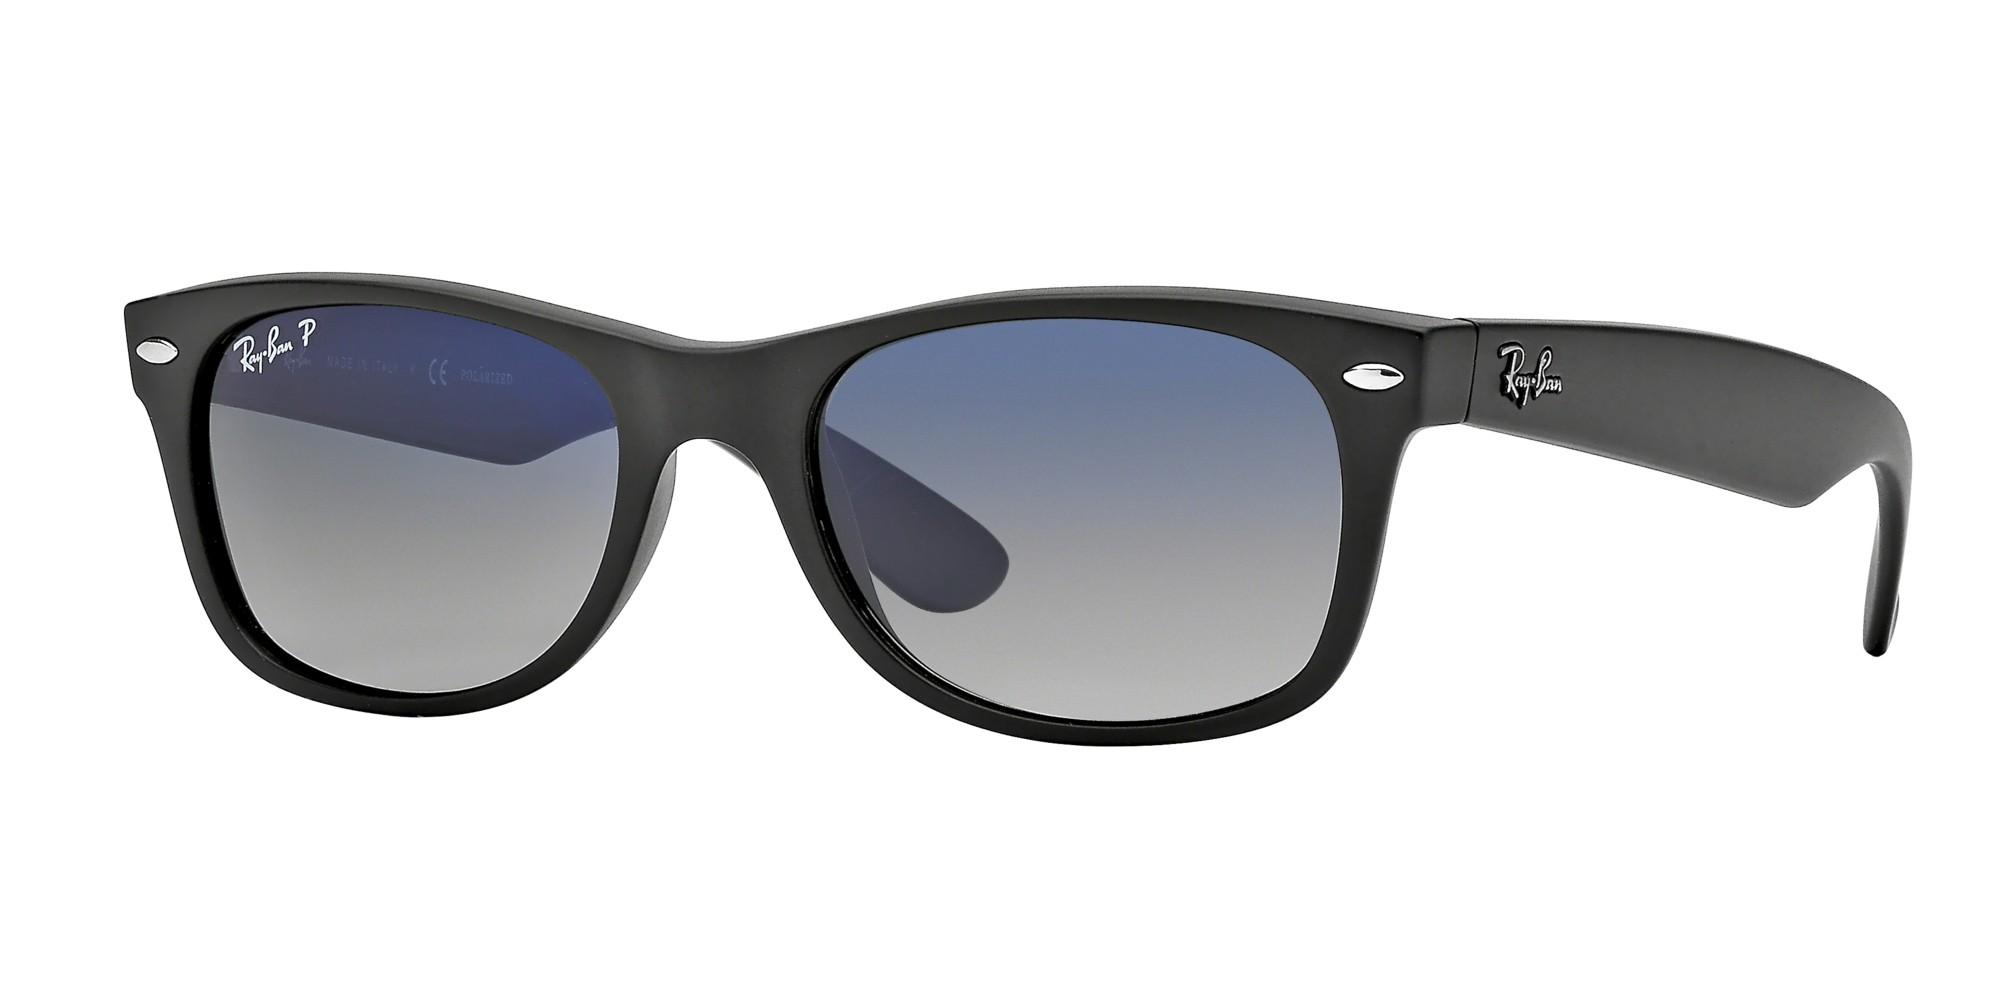 6b6b3235ab Ray-Ban RB2132 NEW WAYFARER Sunglasses